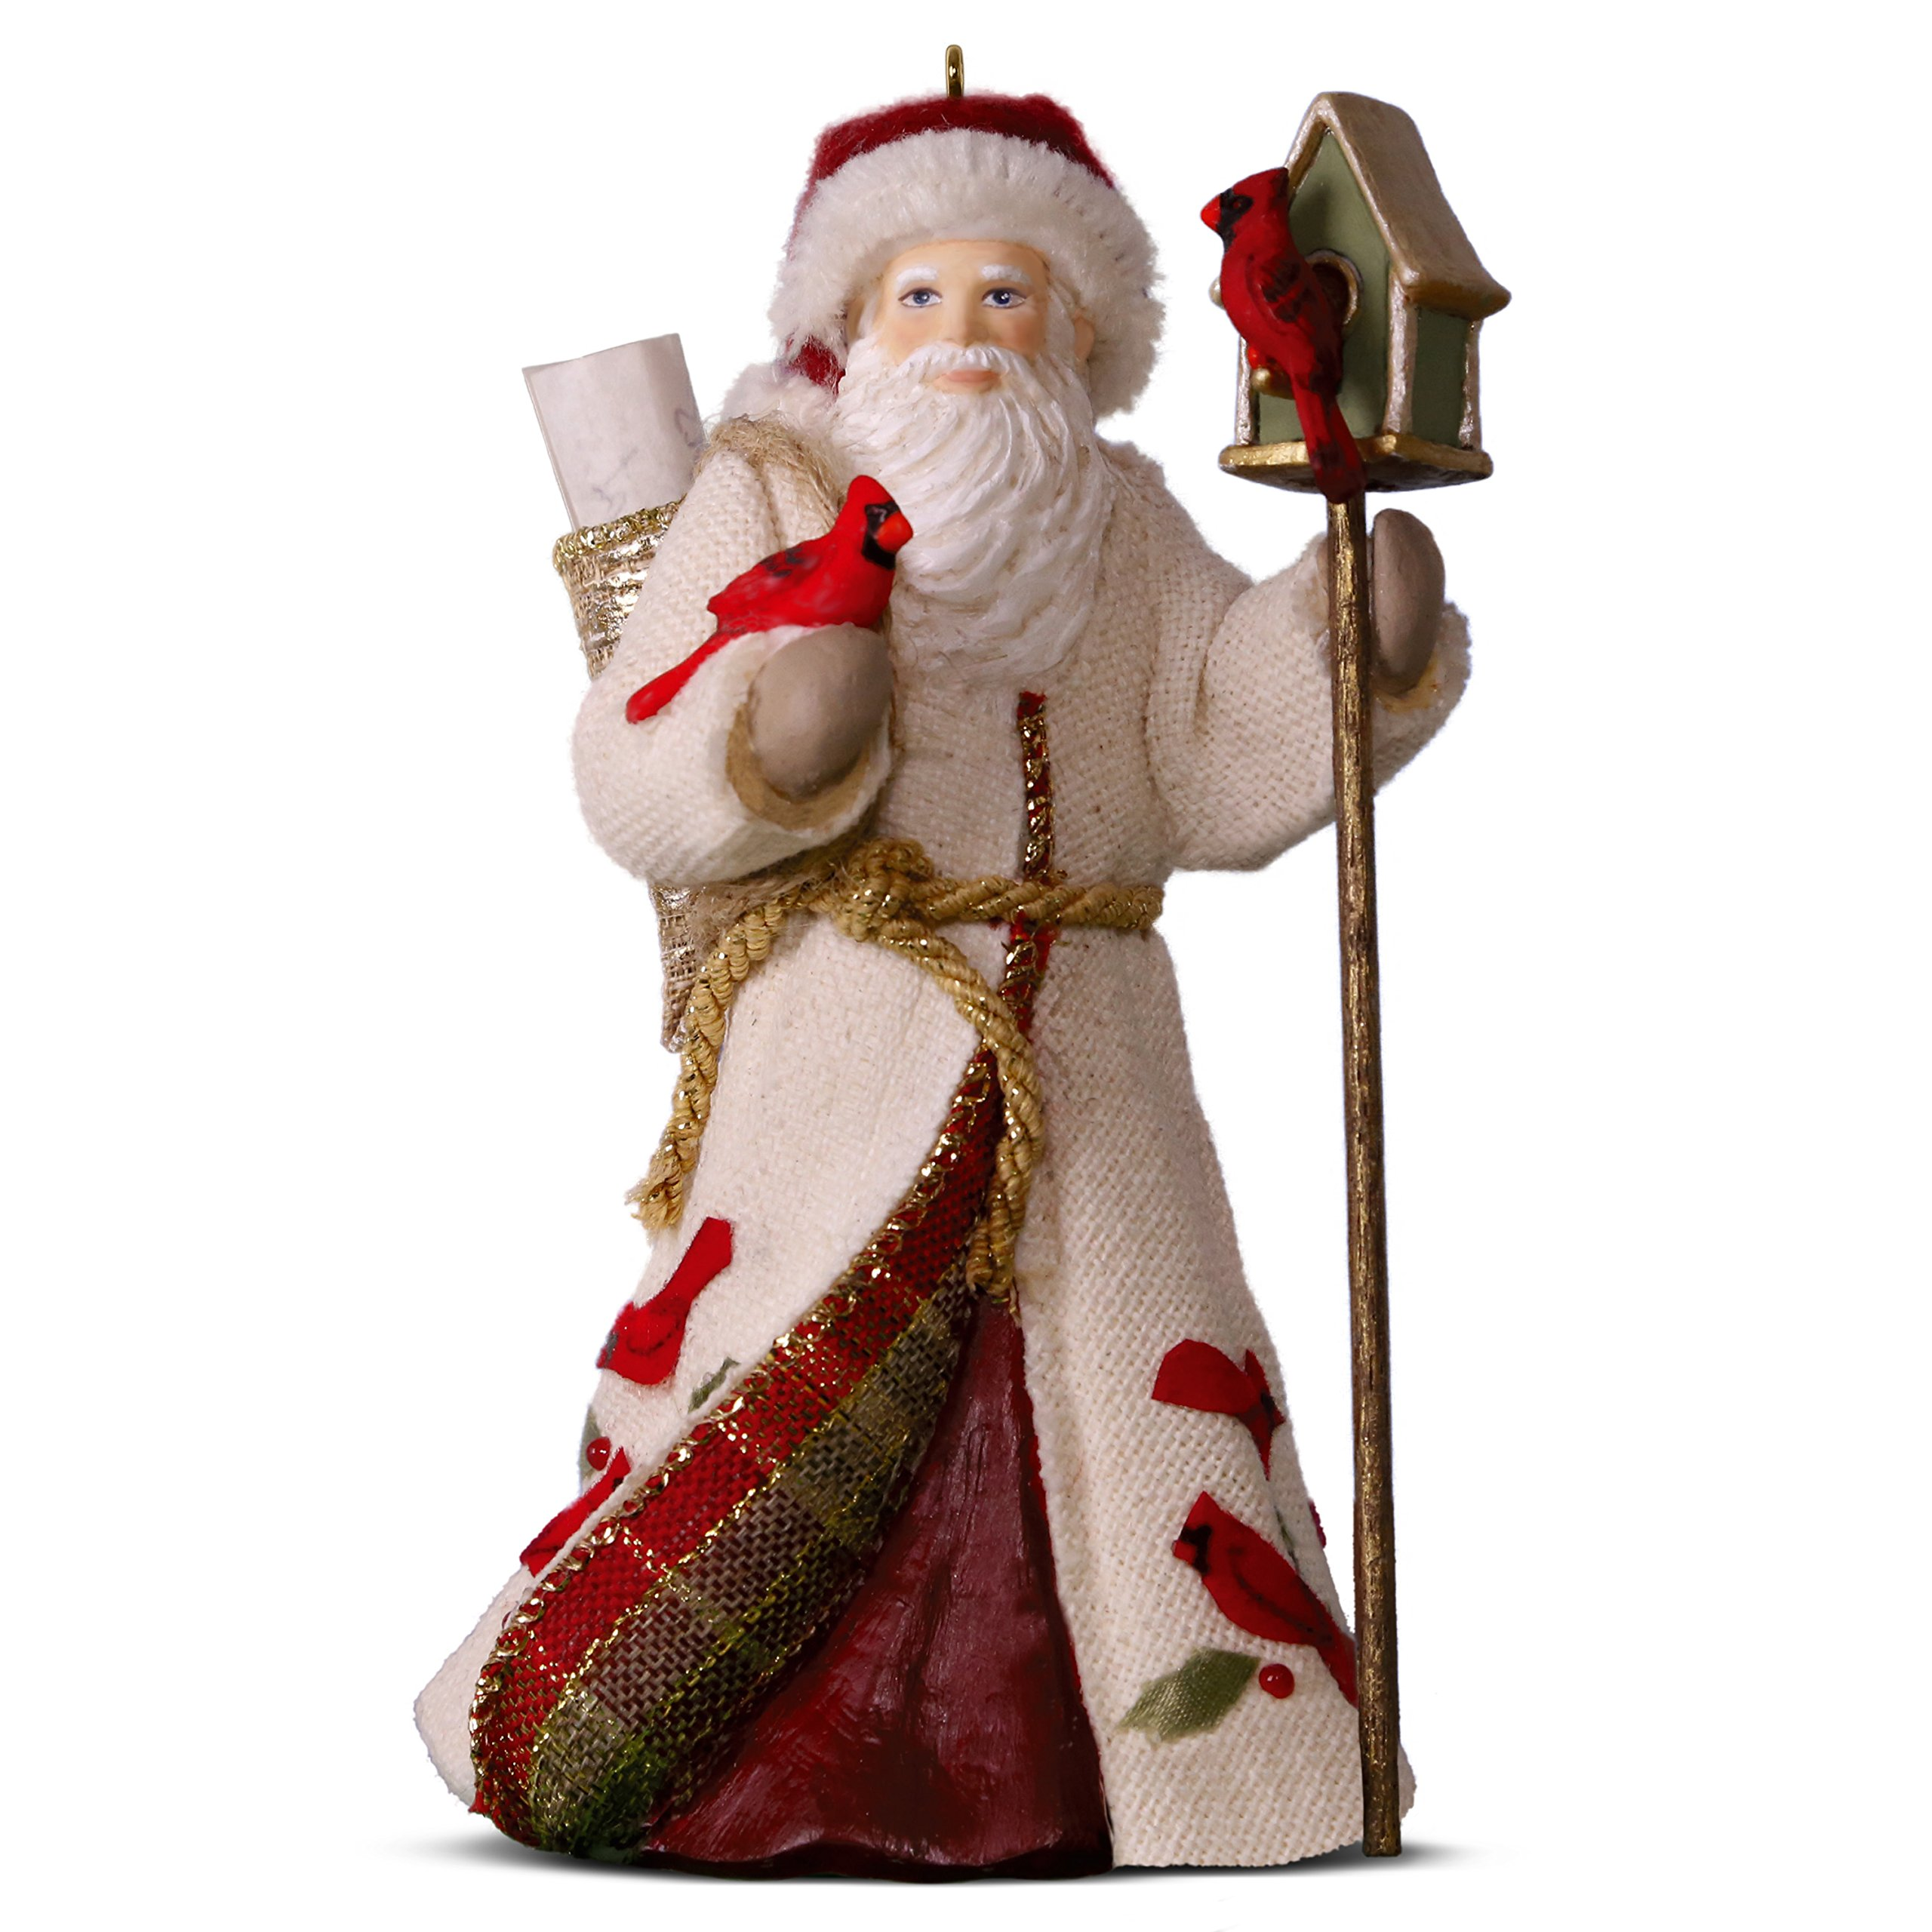 Hallmark Keepsake Christmas Ornament 2018 Year Dated, Happy Memories Father Christmas by Hallmark